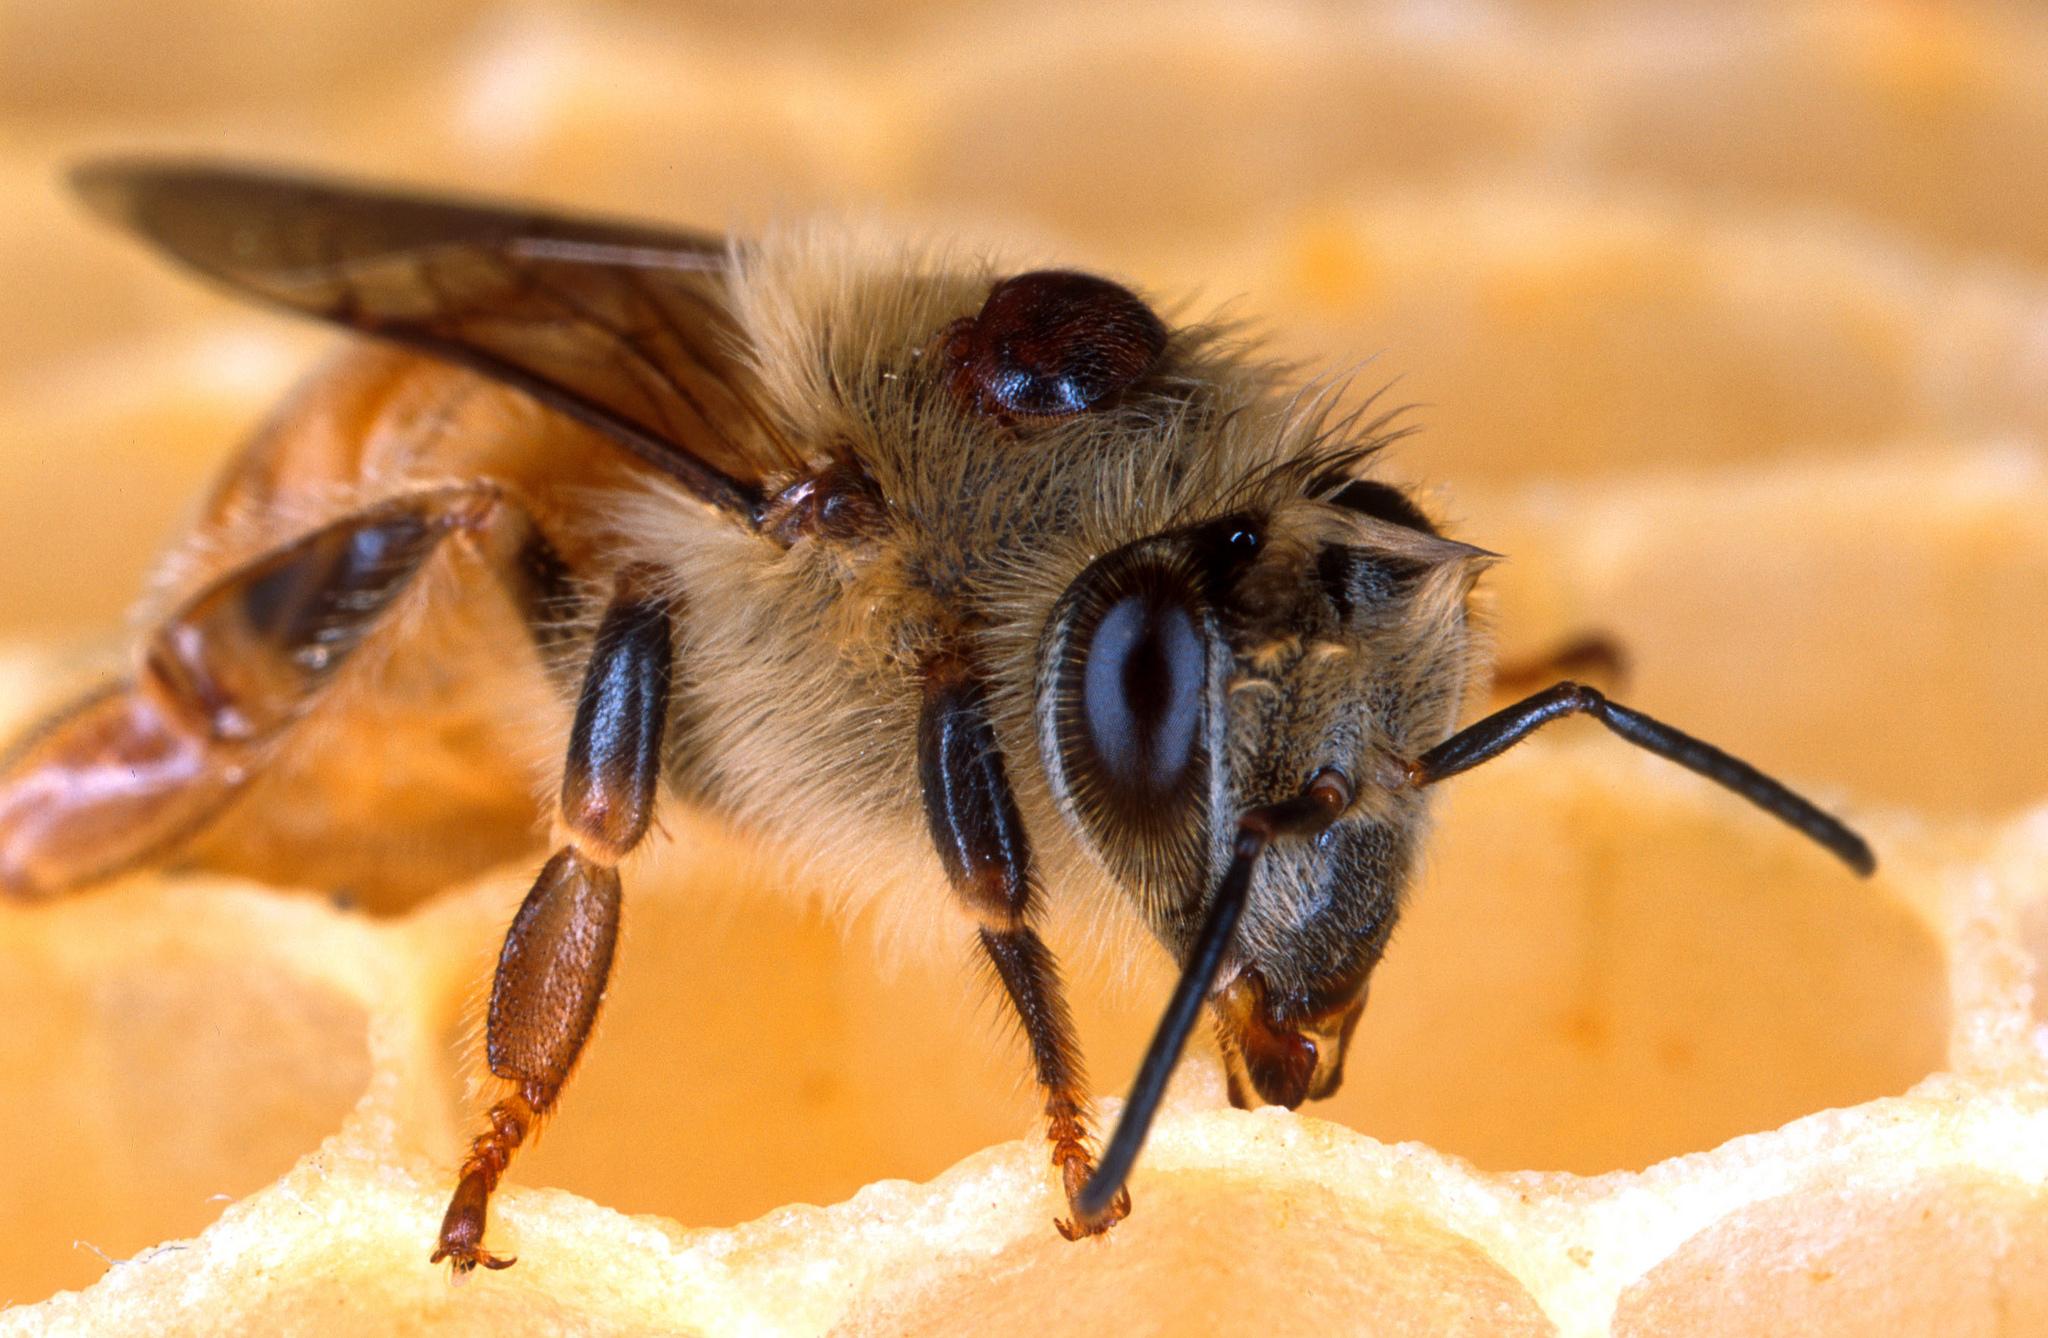 Honeybee with Varroa mite